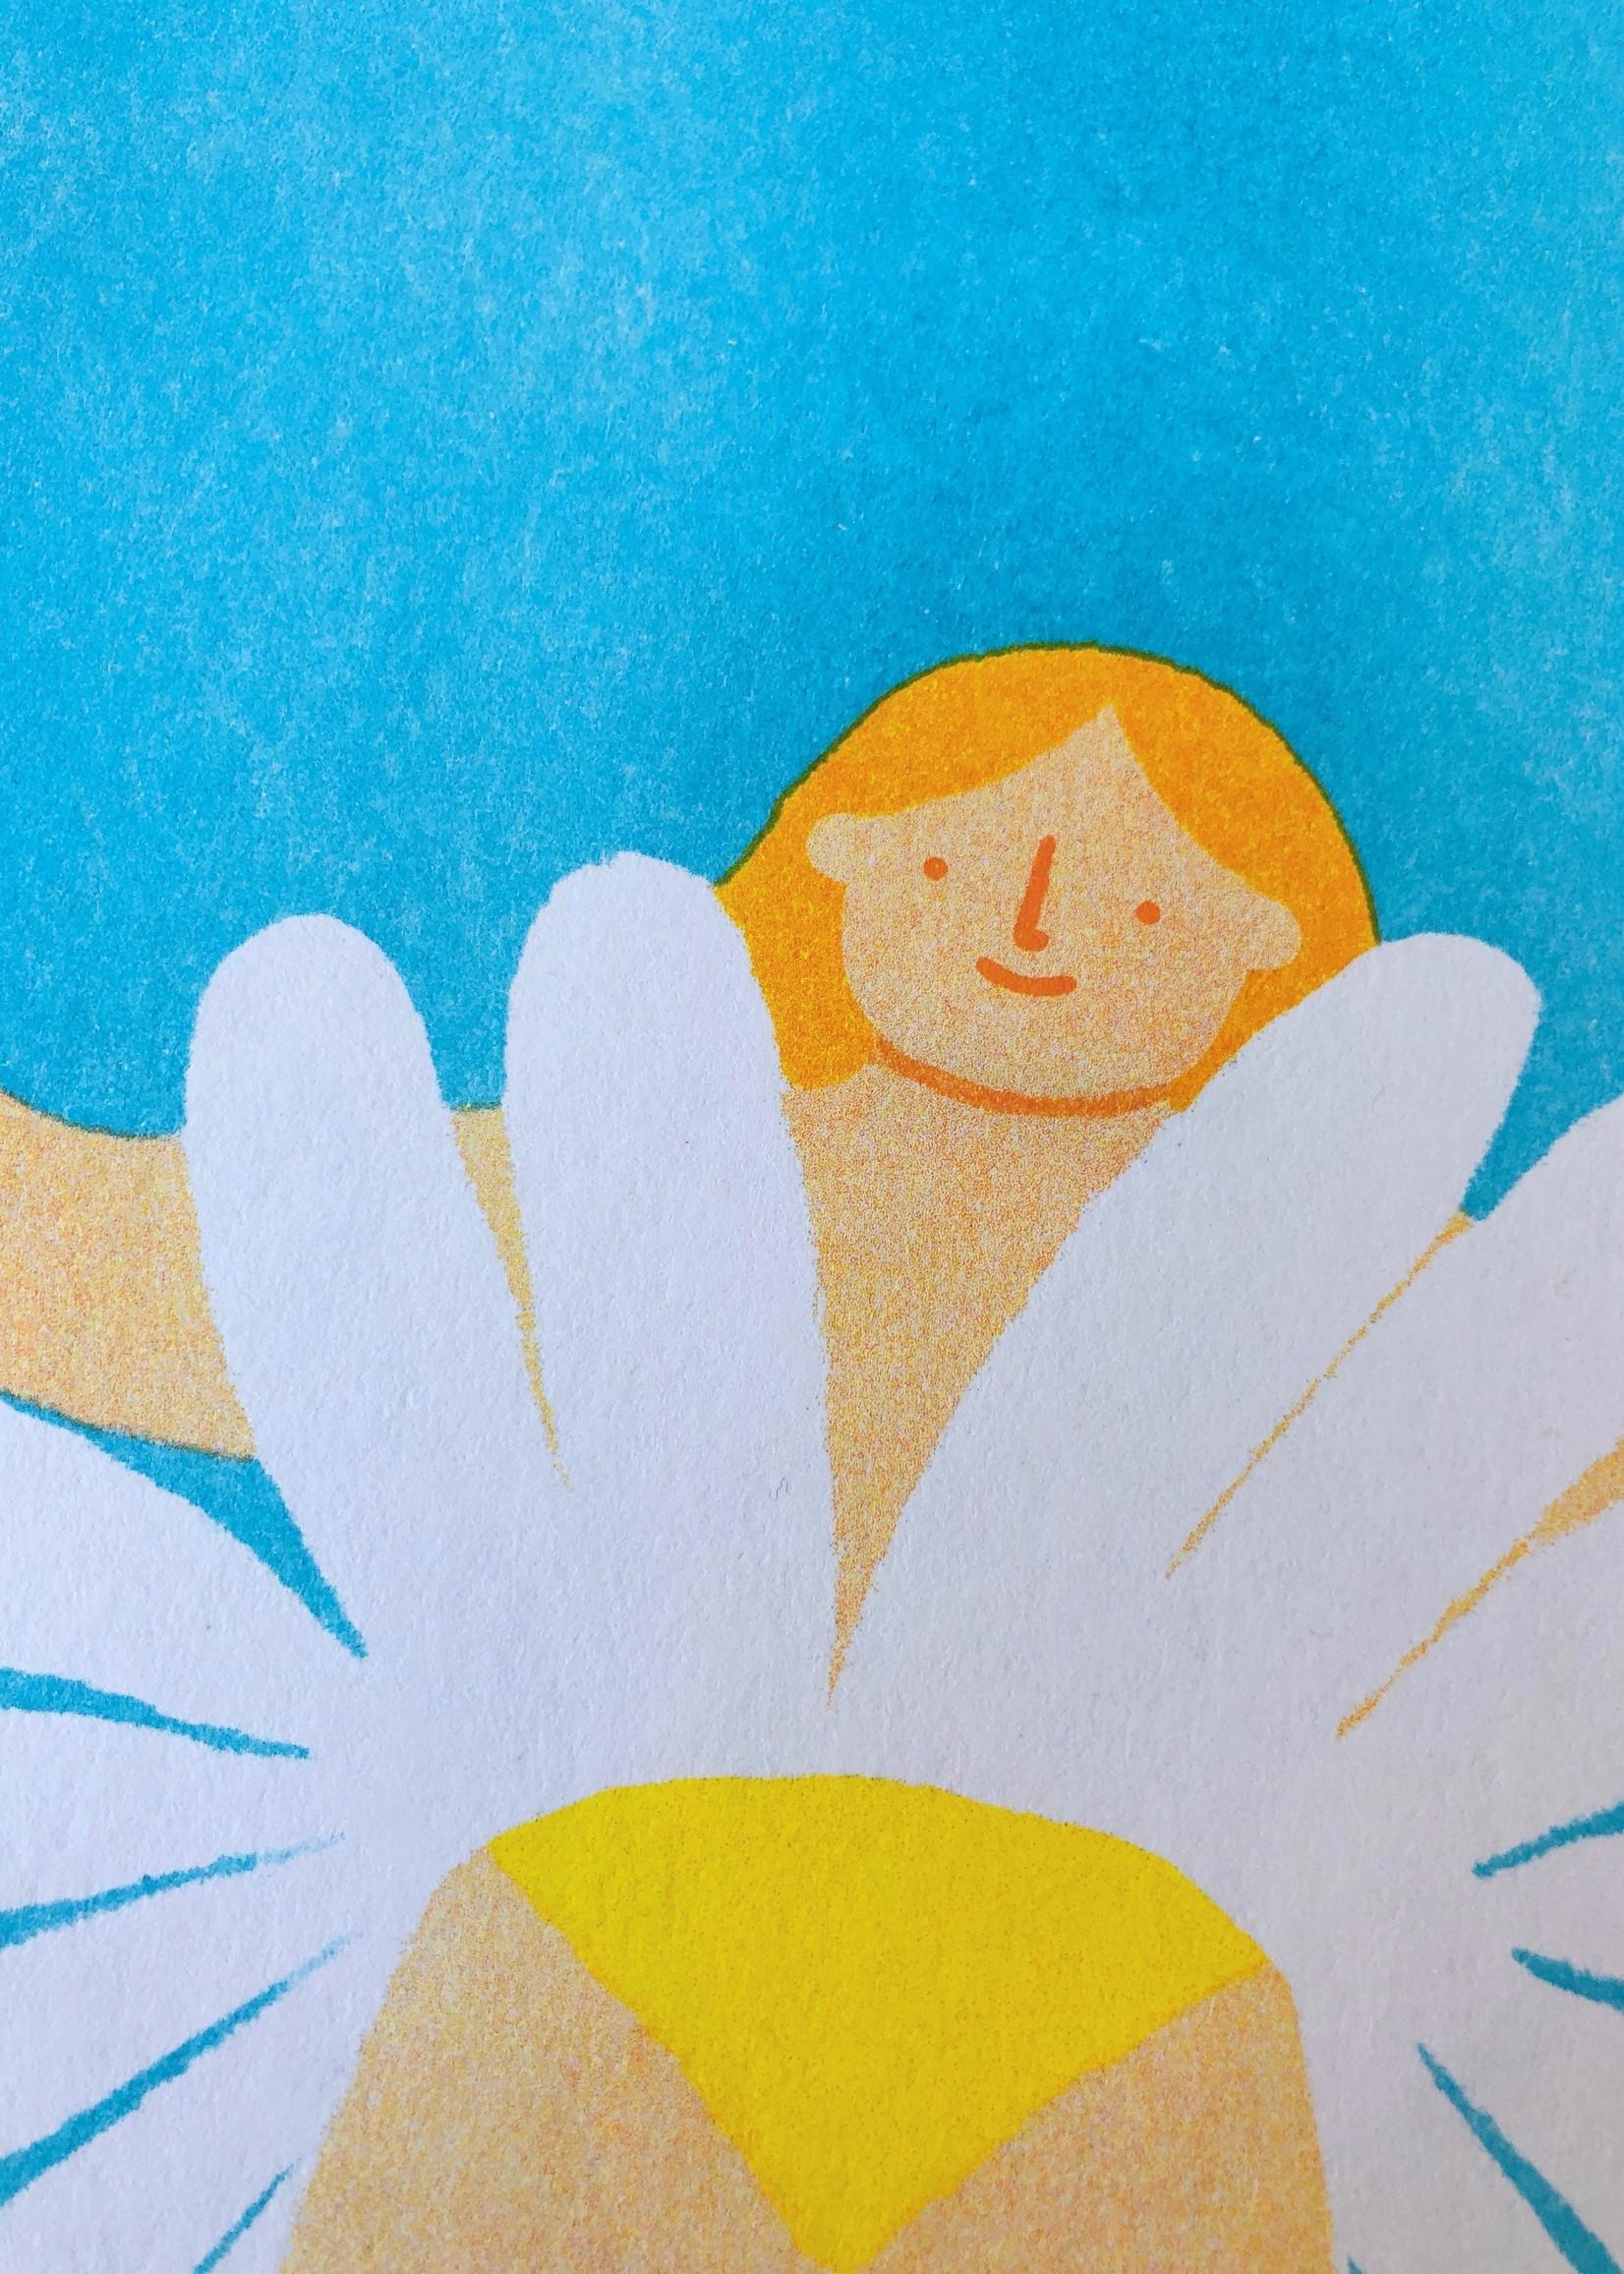 Stay Home Club Affiches Eleonora Arrosio par Stay Home Club, 28 x 43 cm